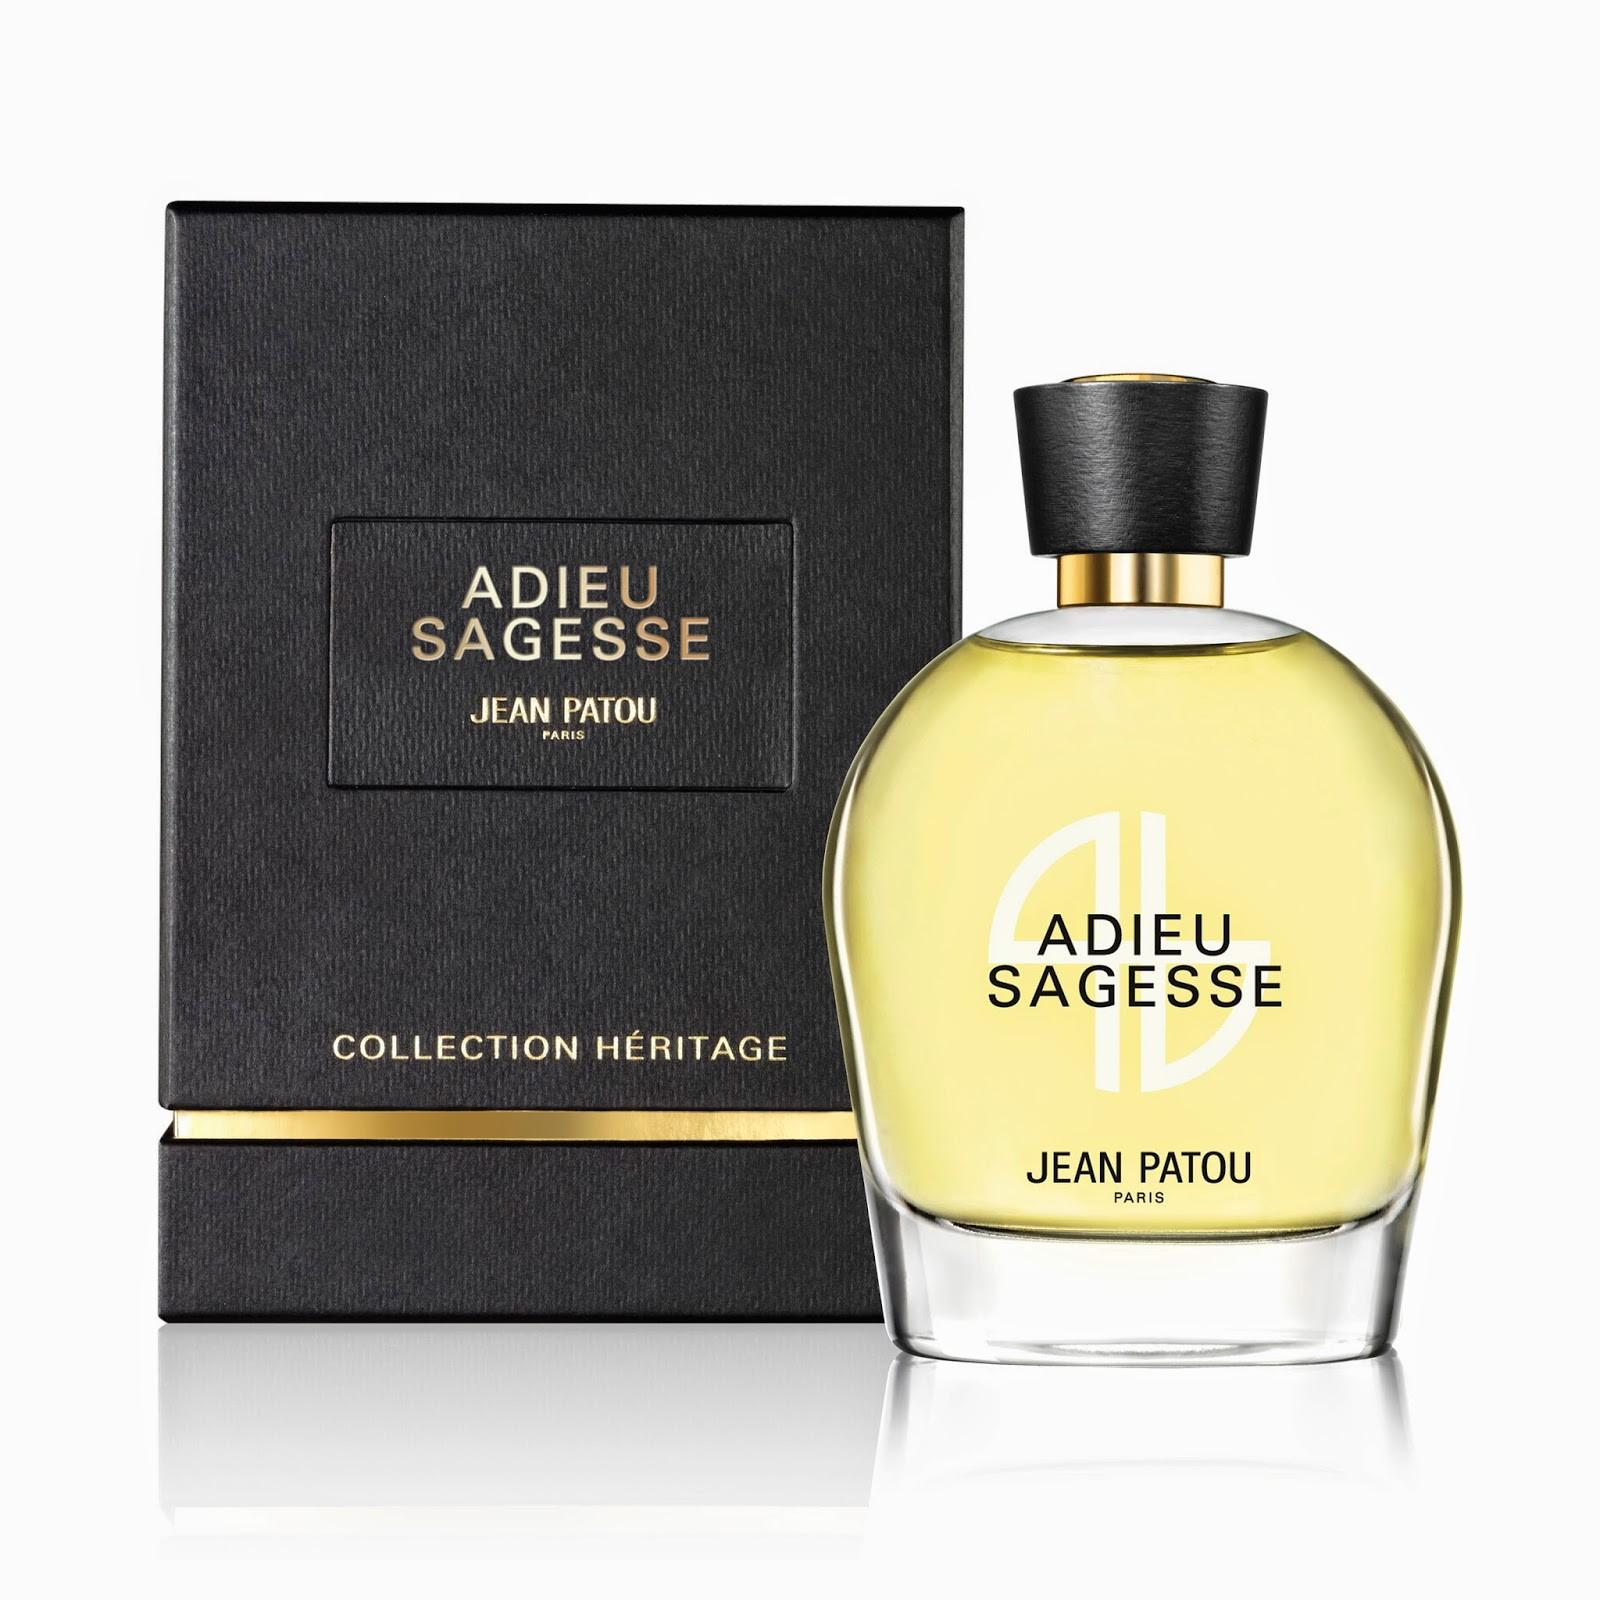 Jean Patou Adieu Sagesse (2014) аромат для женщин